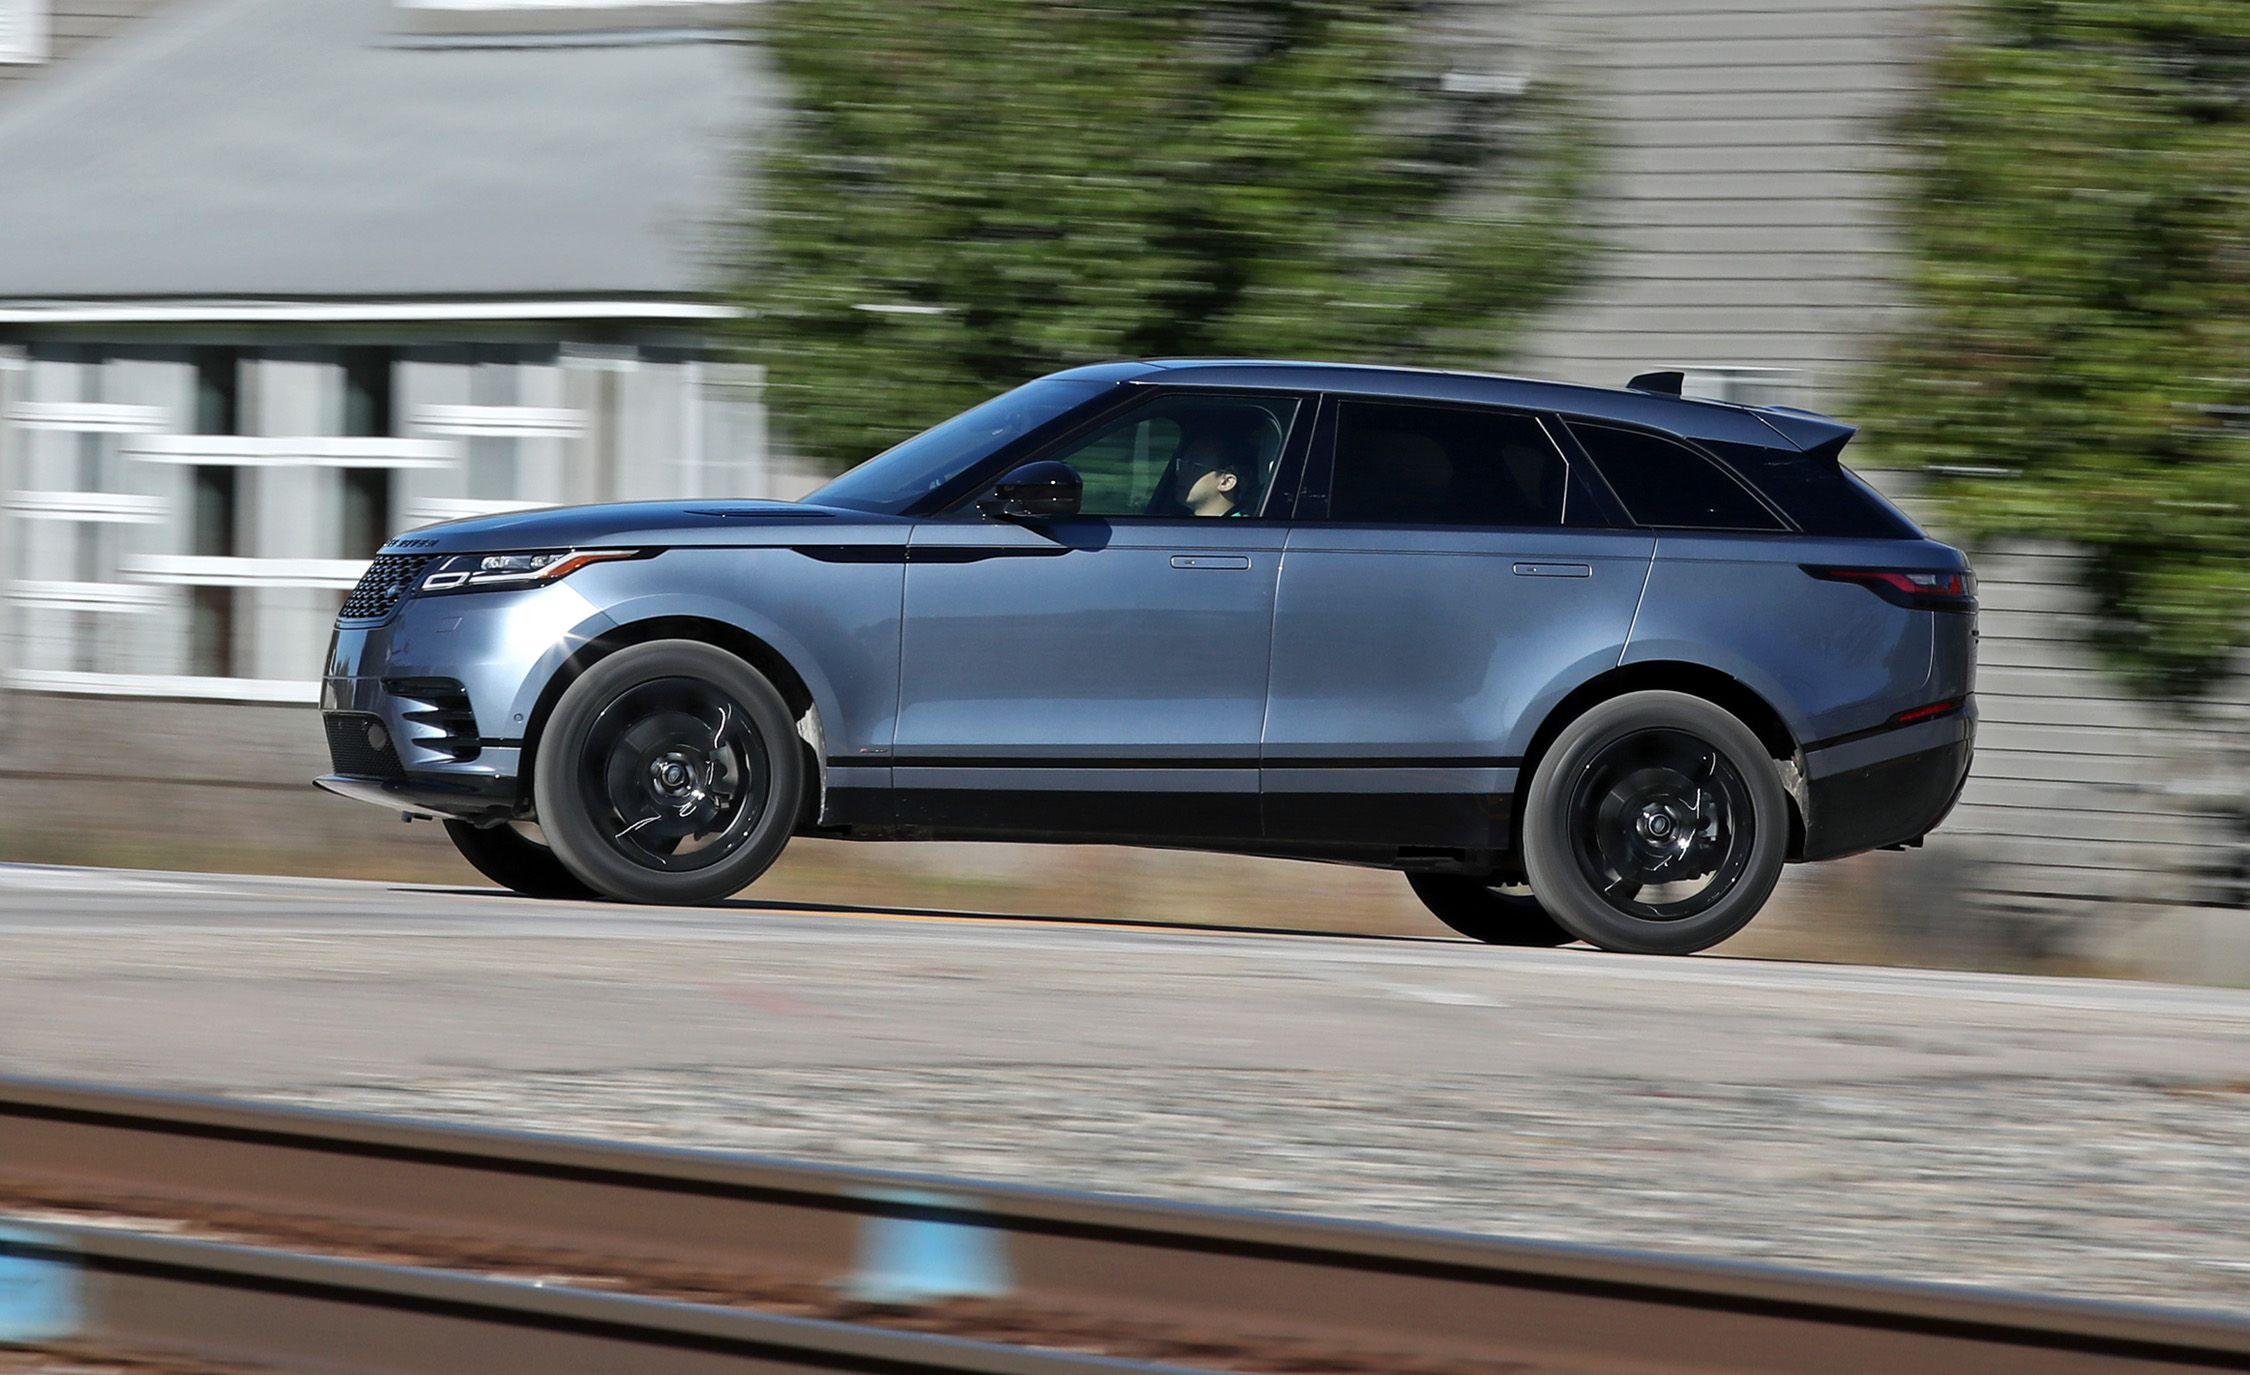 Range Rover Velar Tested In Depth What Luxury SUVs Are All - Cheap range rover insurance